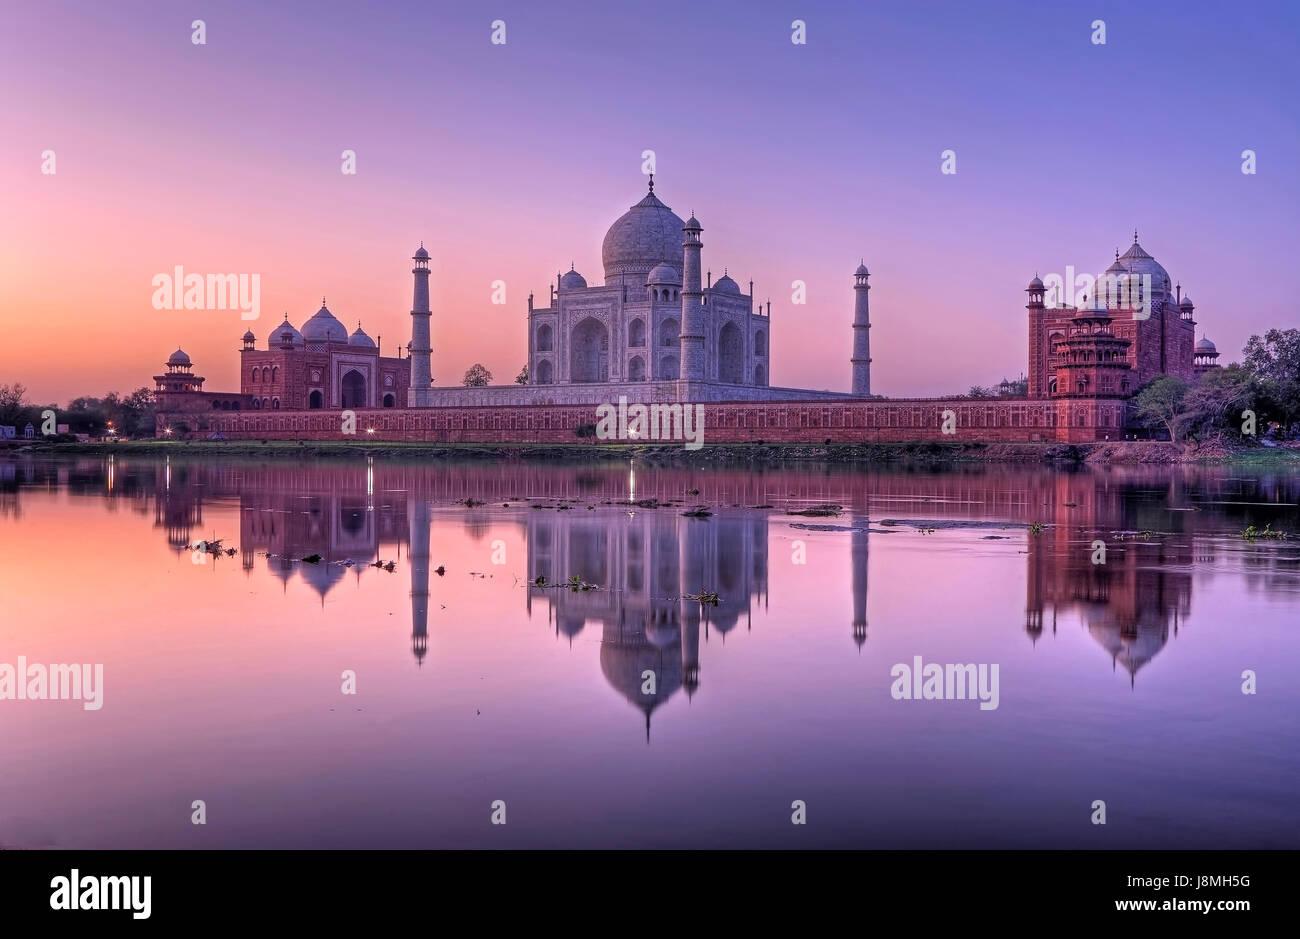 Taj Mahal, Agra, Uttar Pradesh, India. Immagini Stock